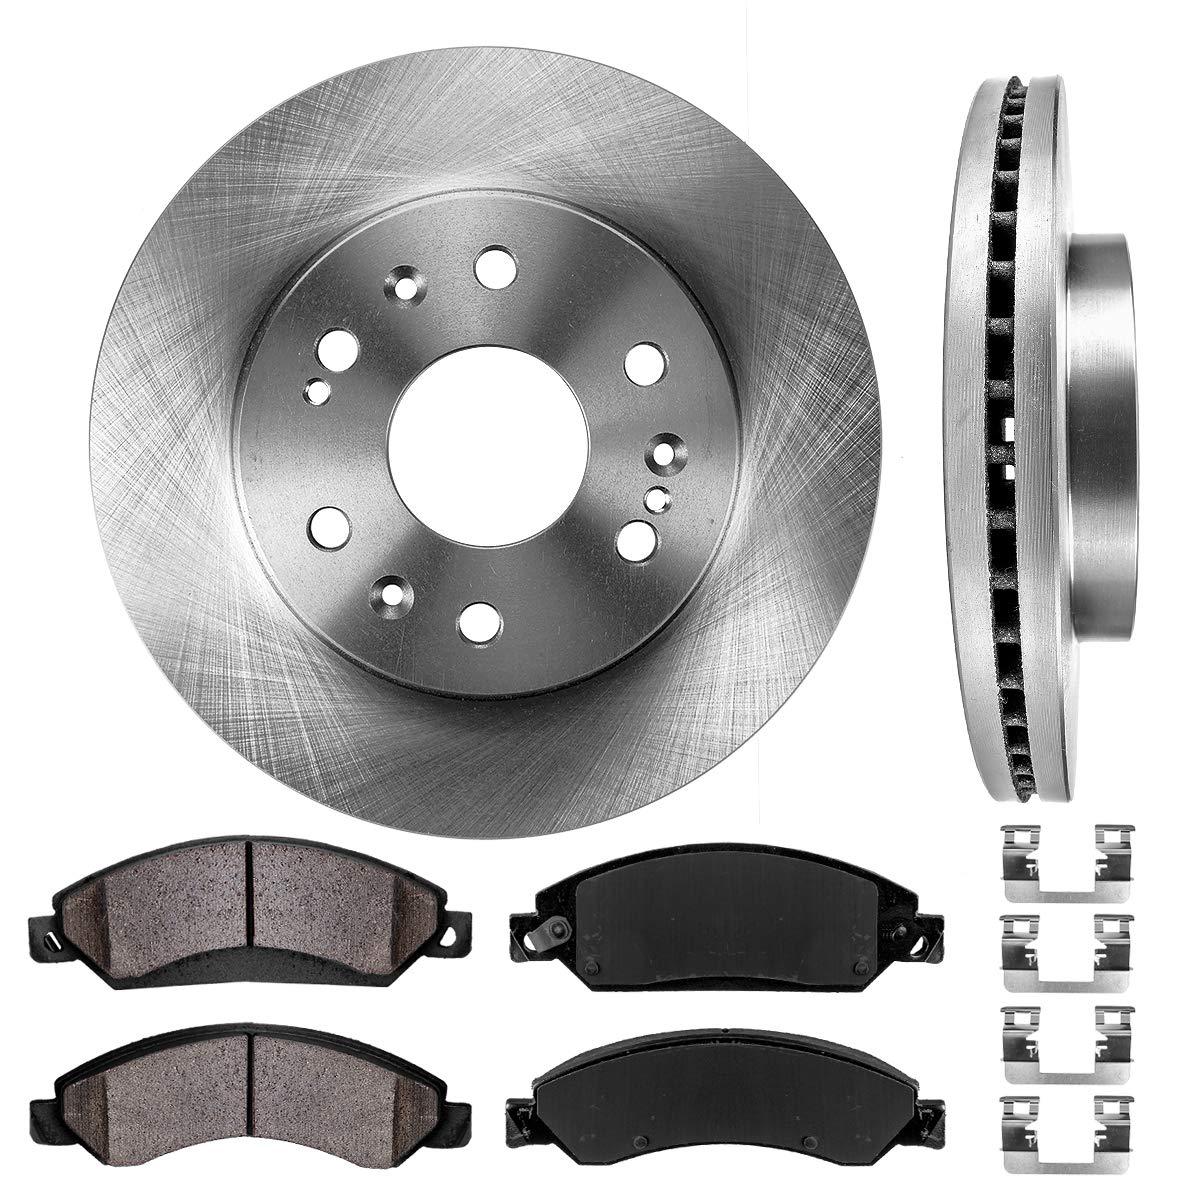 FRONT 330 mm Premium OE 6 Lug [2] Brake Disc Rotors + [4] Ceramic Brake Pads + Clips Callahan Brake Parts